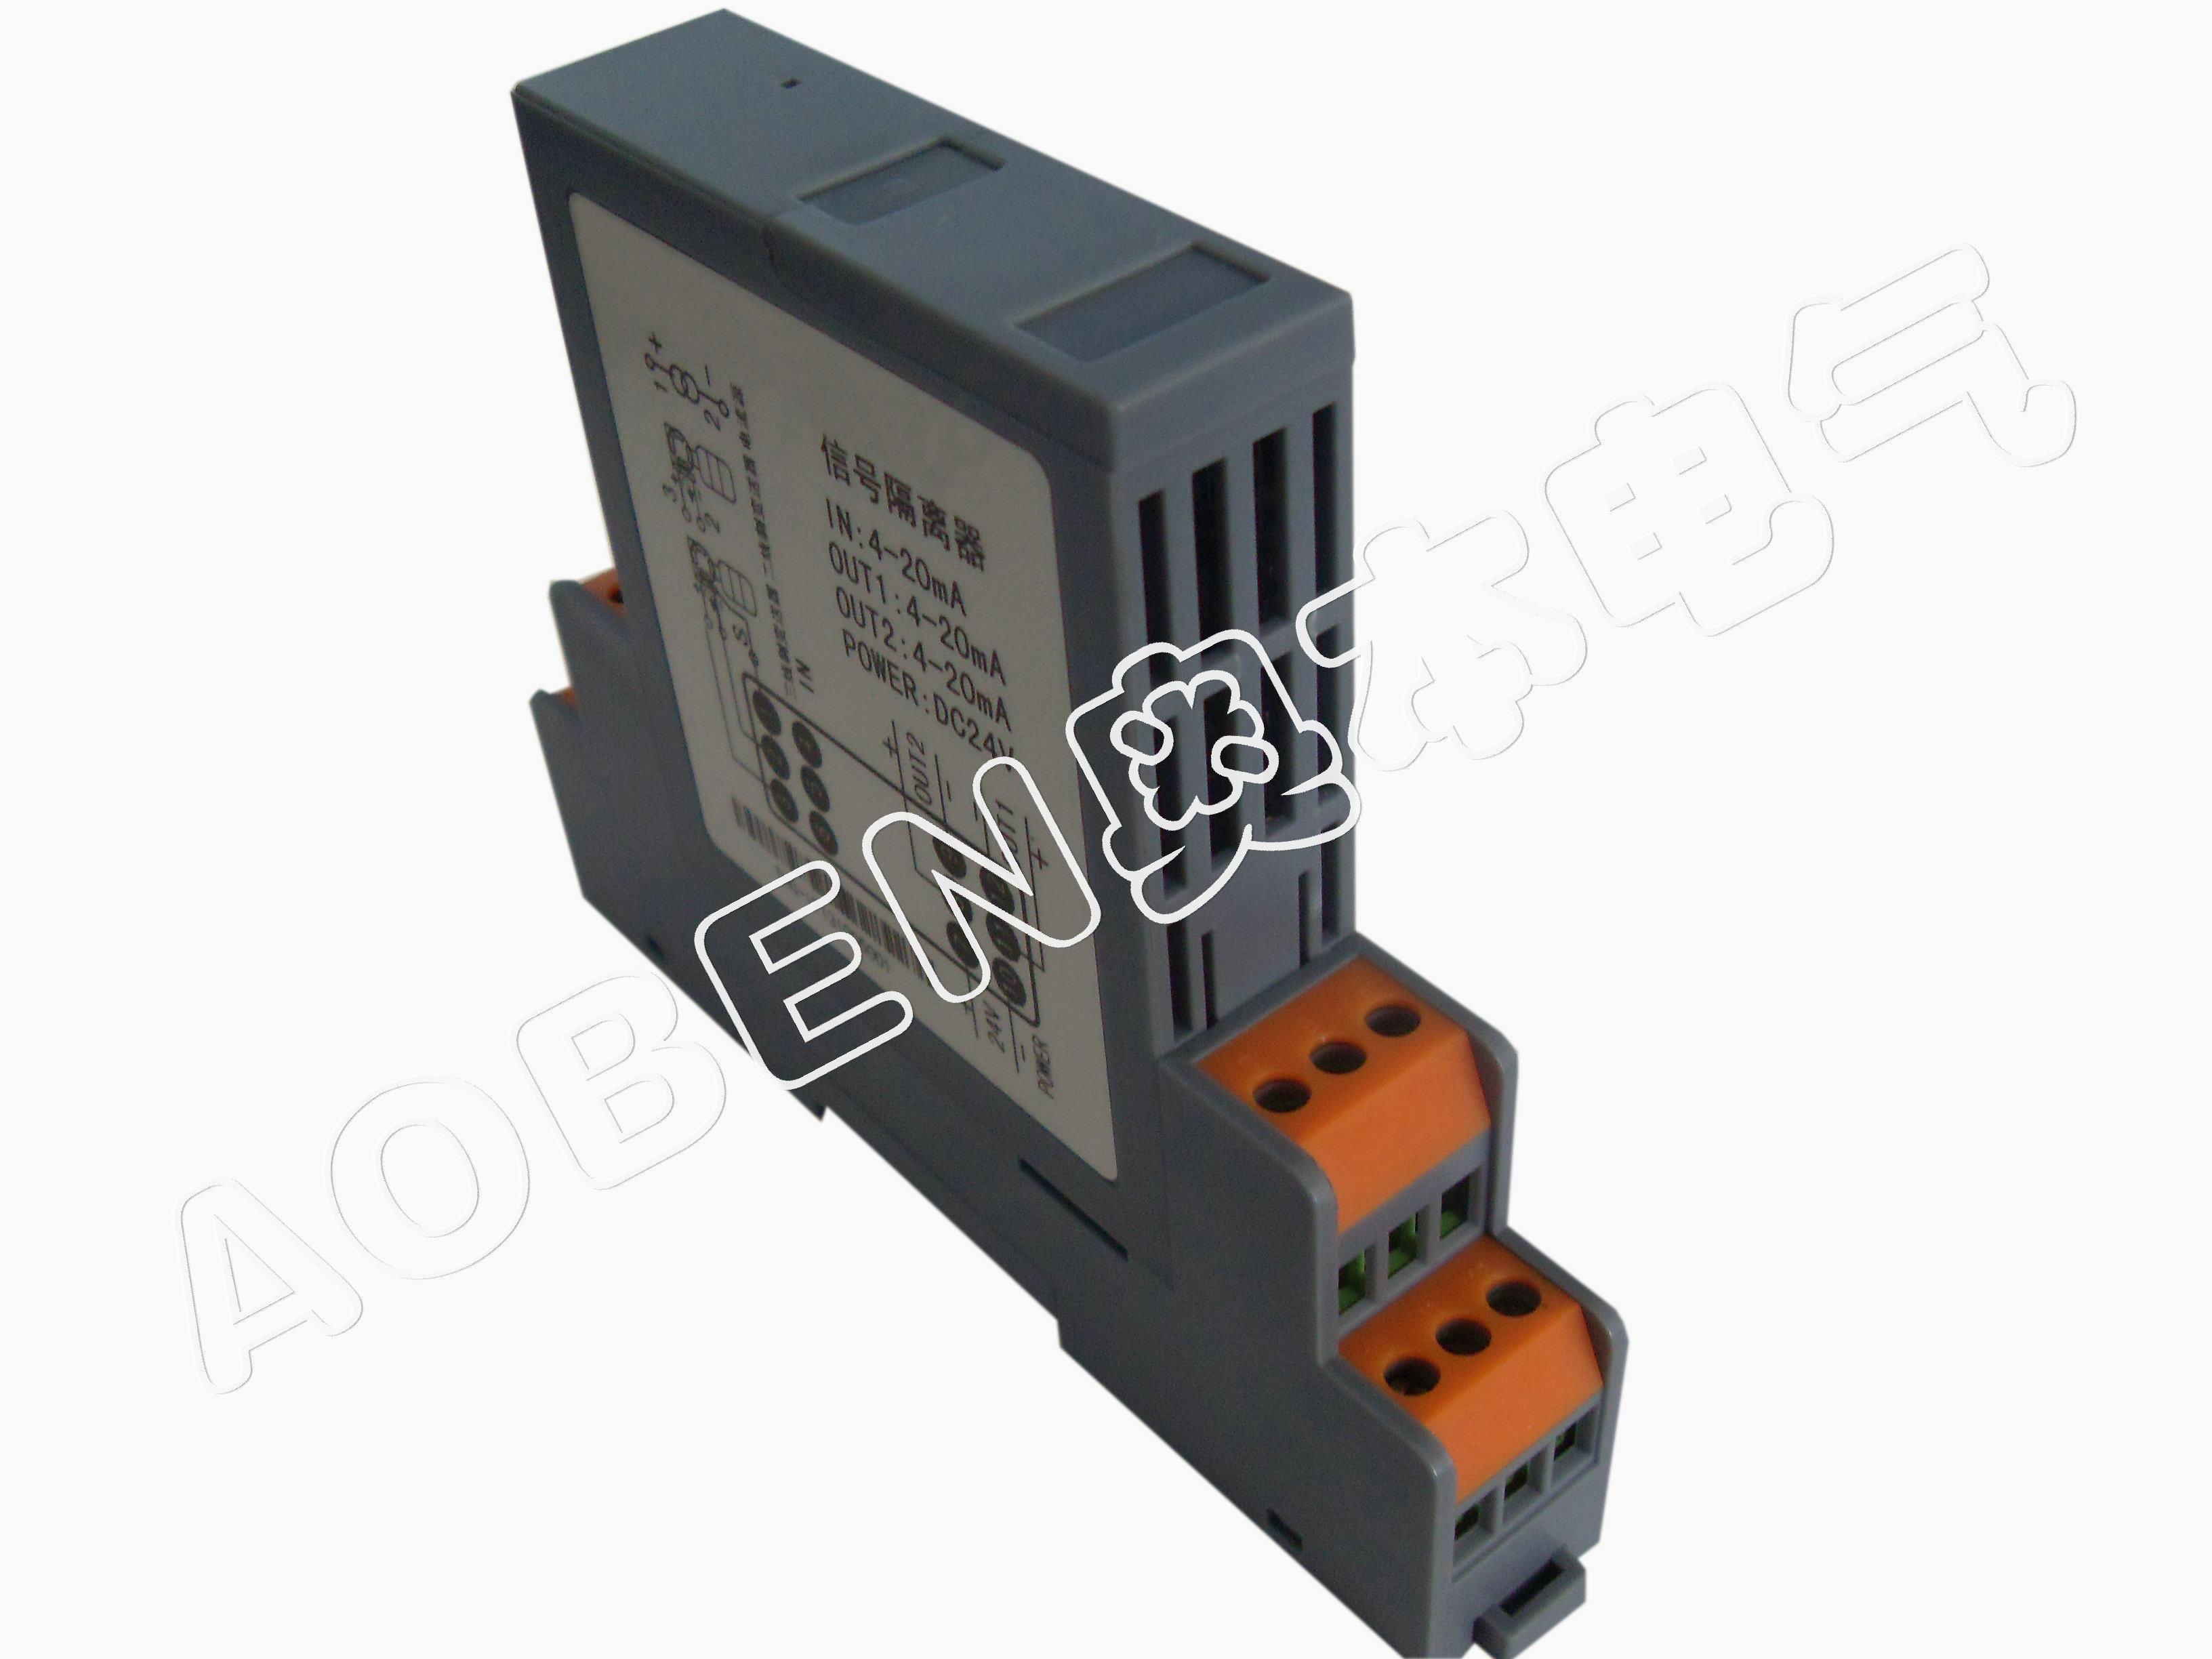 xs-ai 直流信号输入隔离器 xs-ai